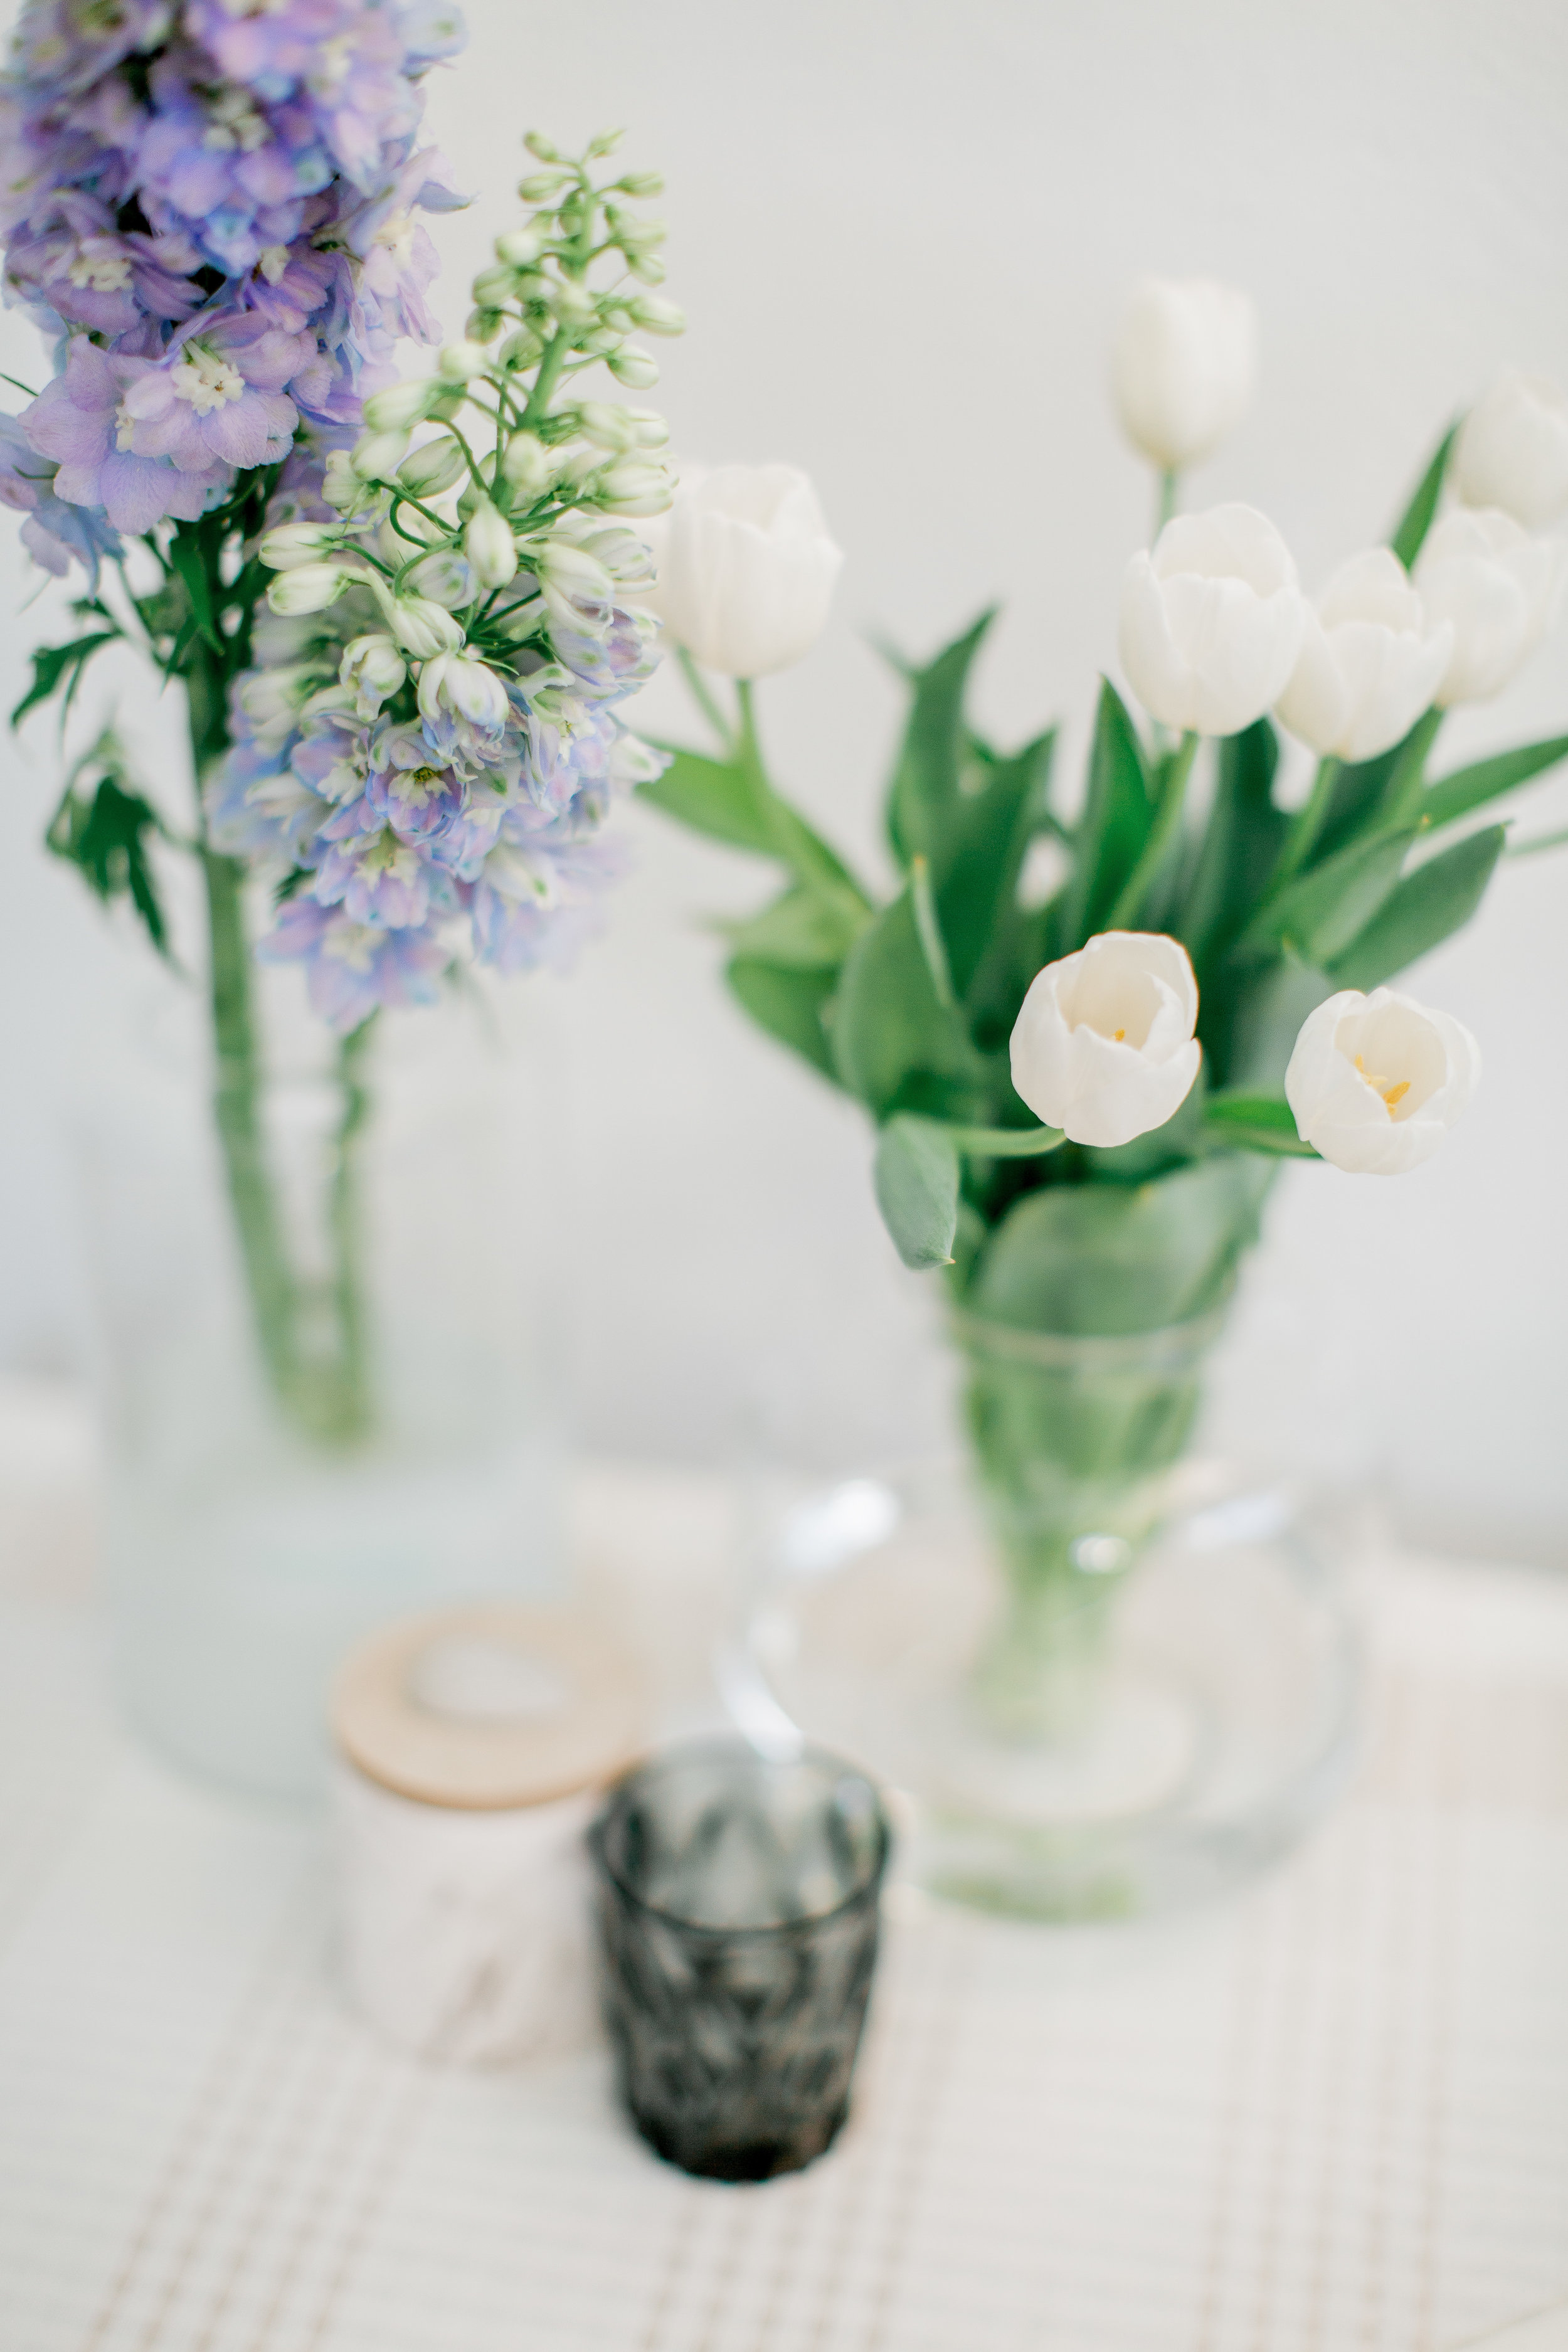 gauteng wedding photographer clareece smit21.jpg